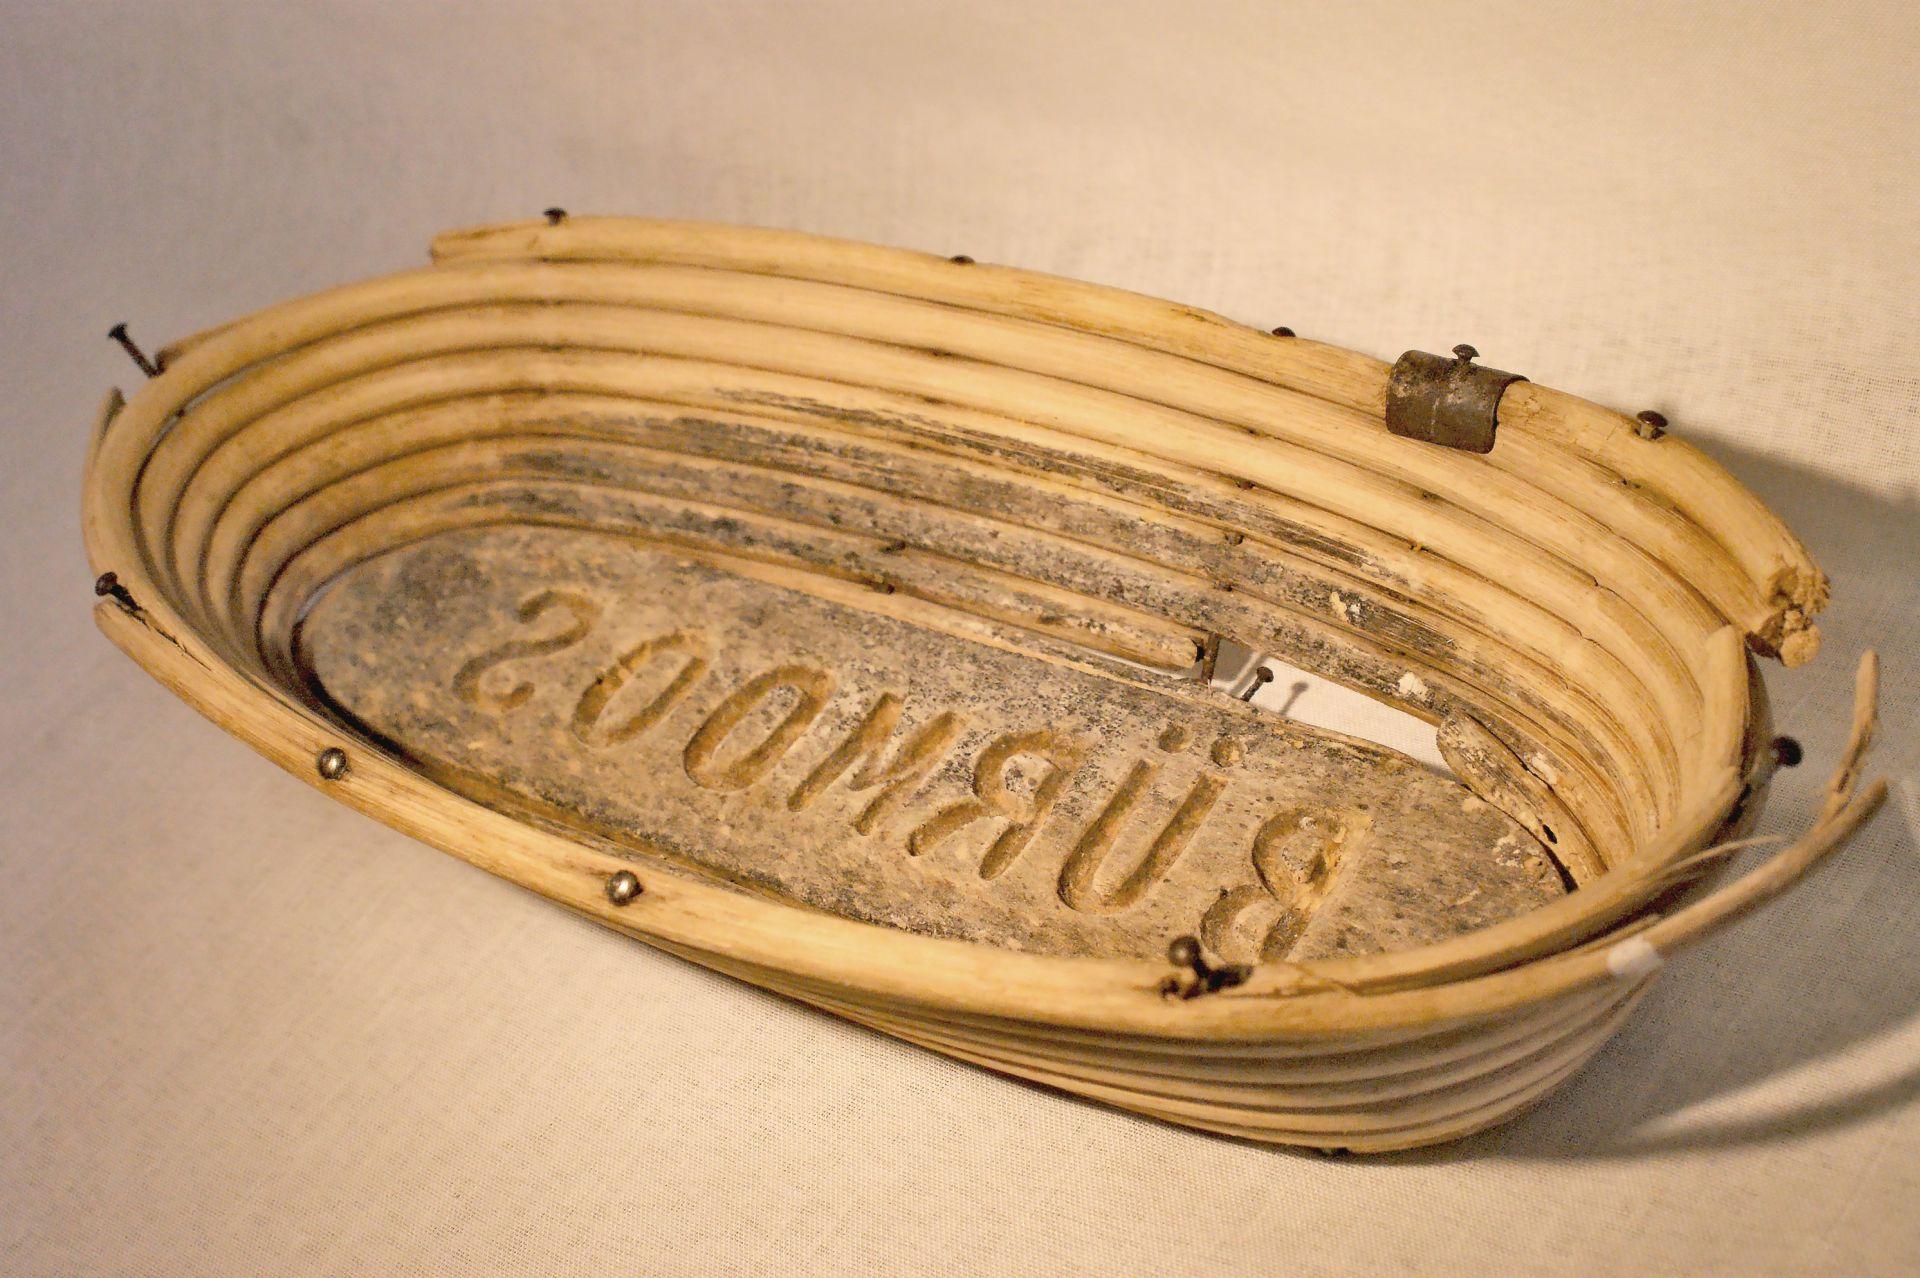 Brotgärkorb 'Bürmoos' von